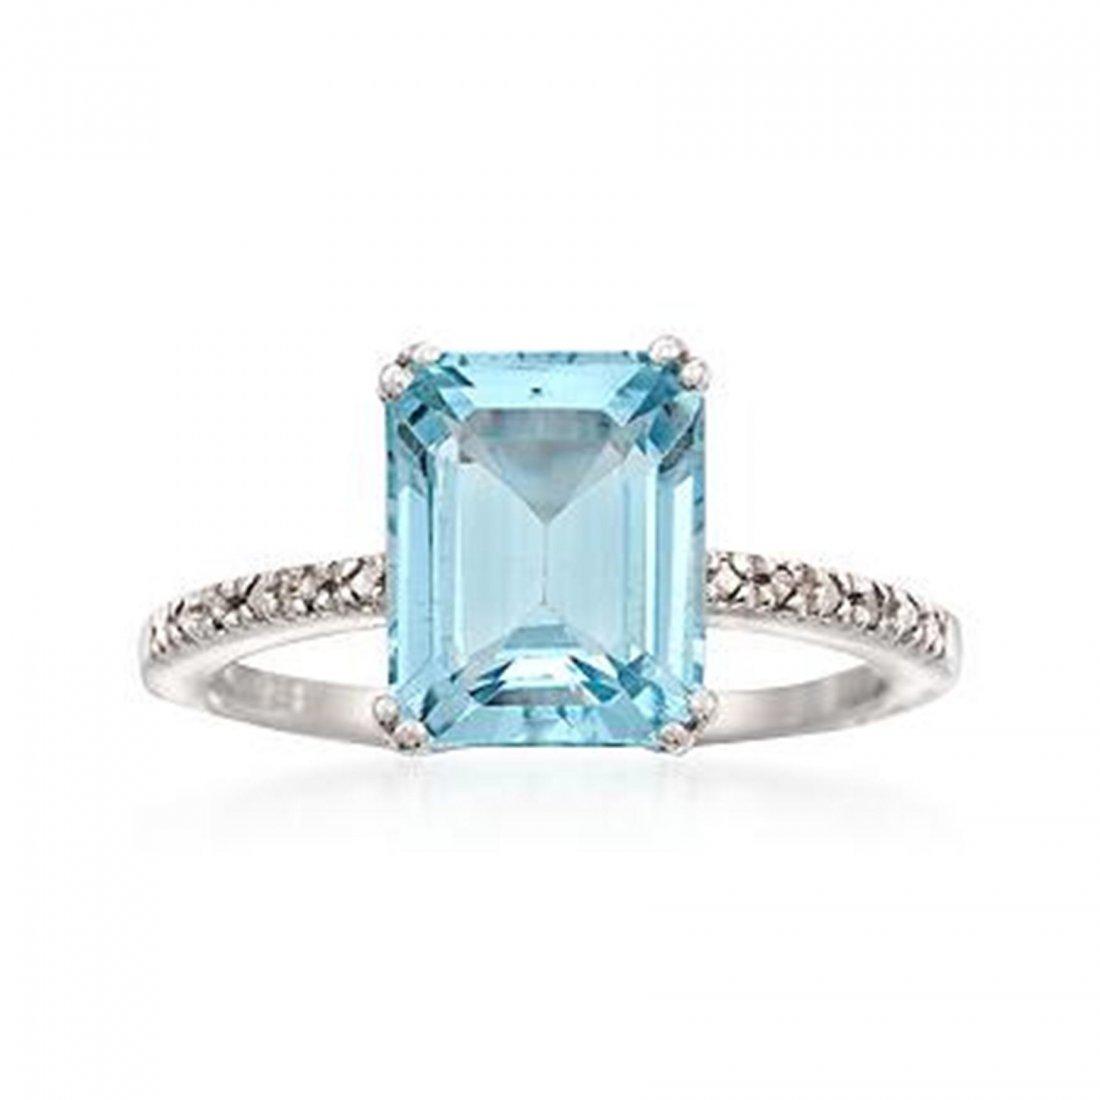 4.40 Carat Emerald-Cut Blue Topaz Ring With Diamor